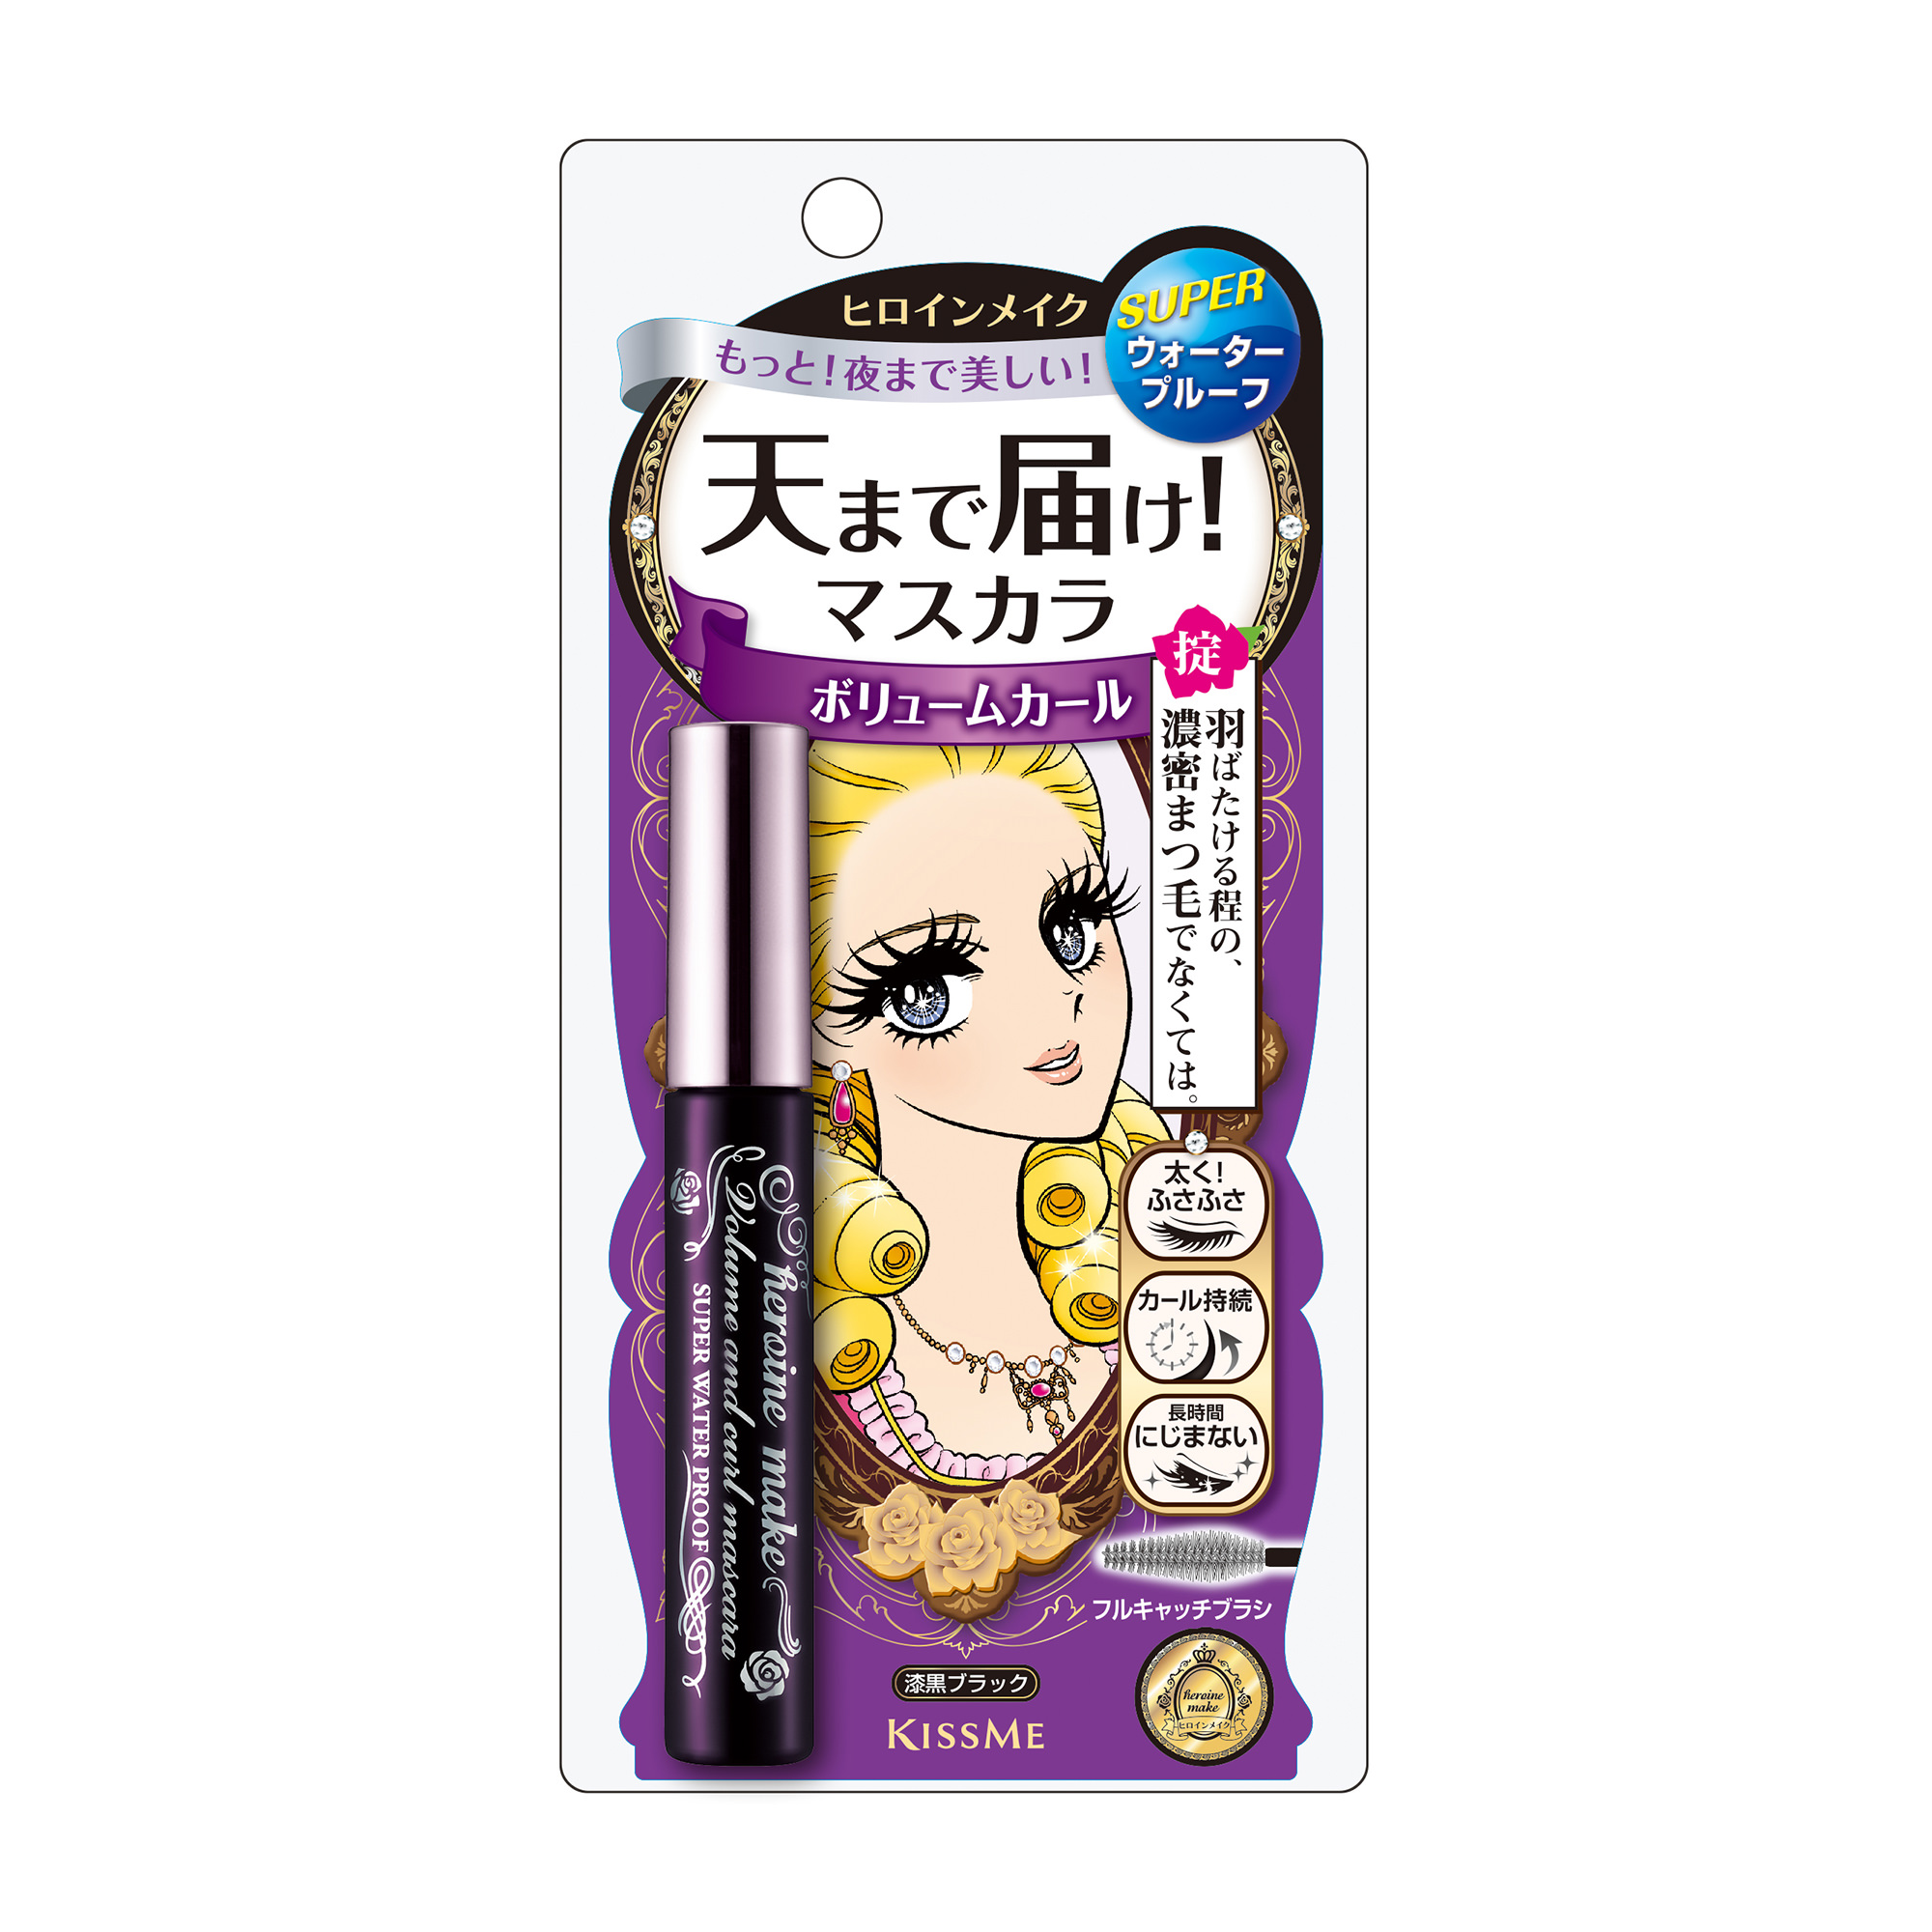 Kiss Me Heroine Make Volume & Curl Mascara Super Waterproof, 01 Super Black